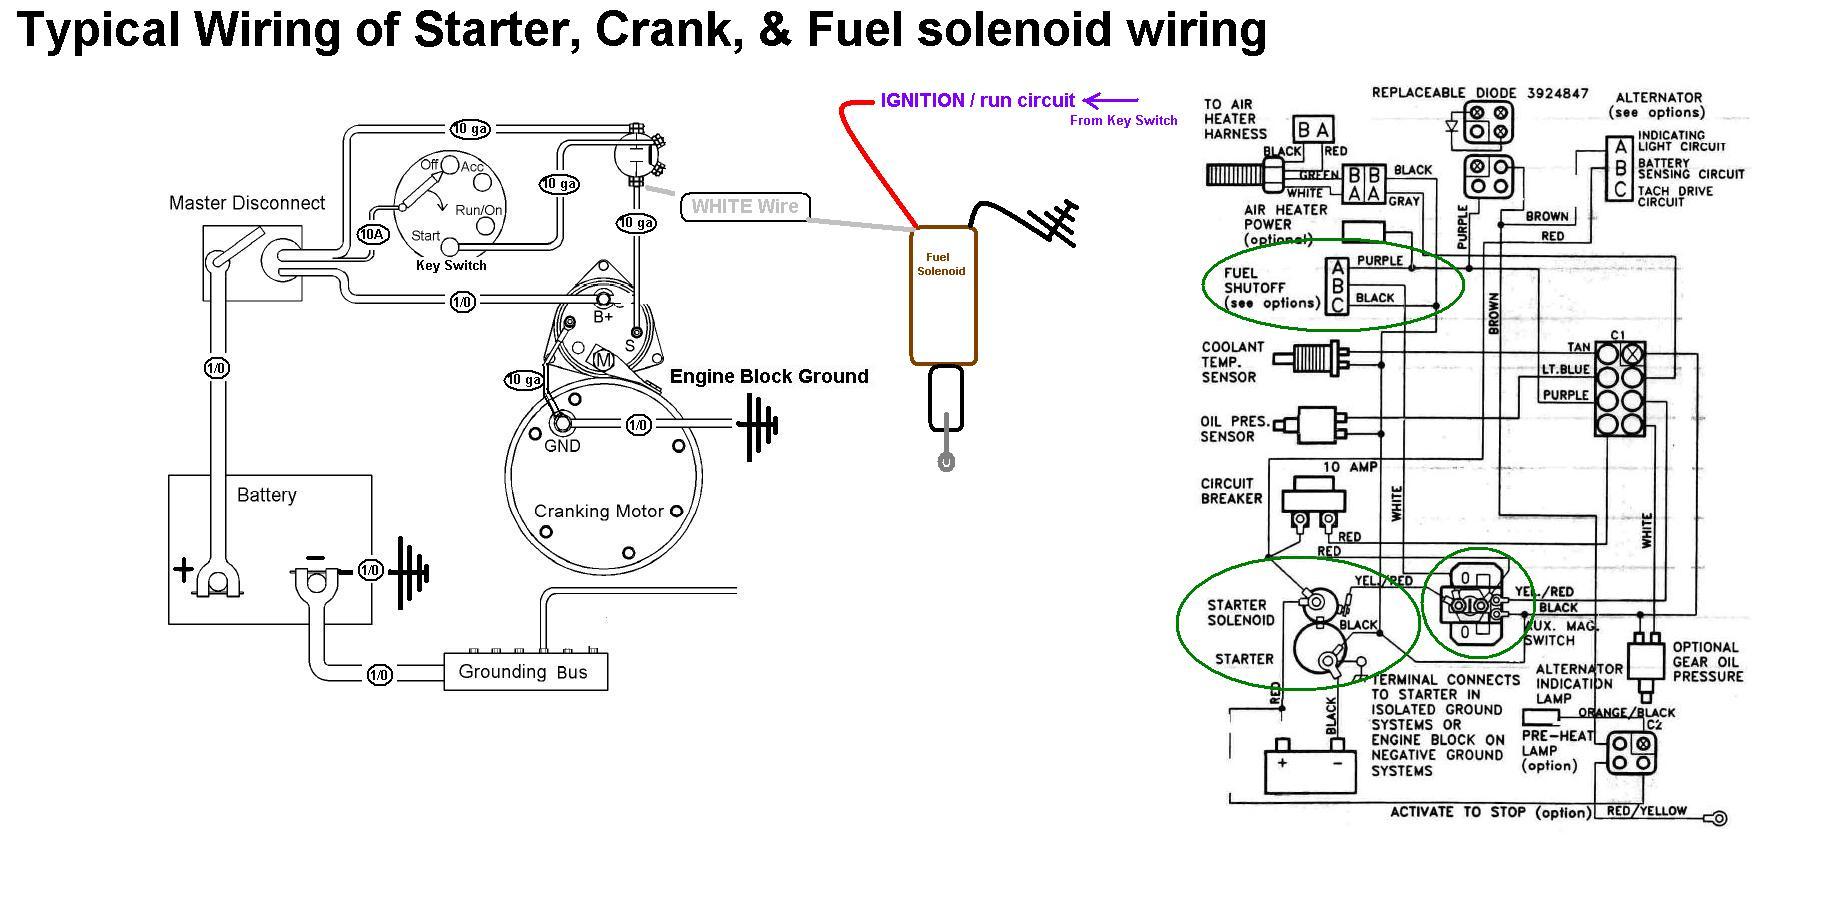 Starter Crank Fuel Solenoid Wiring atlas switch control wiring